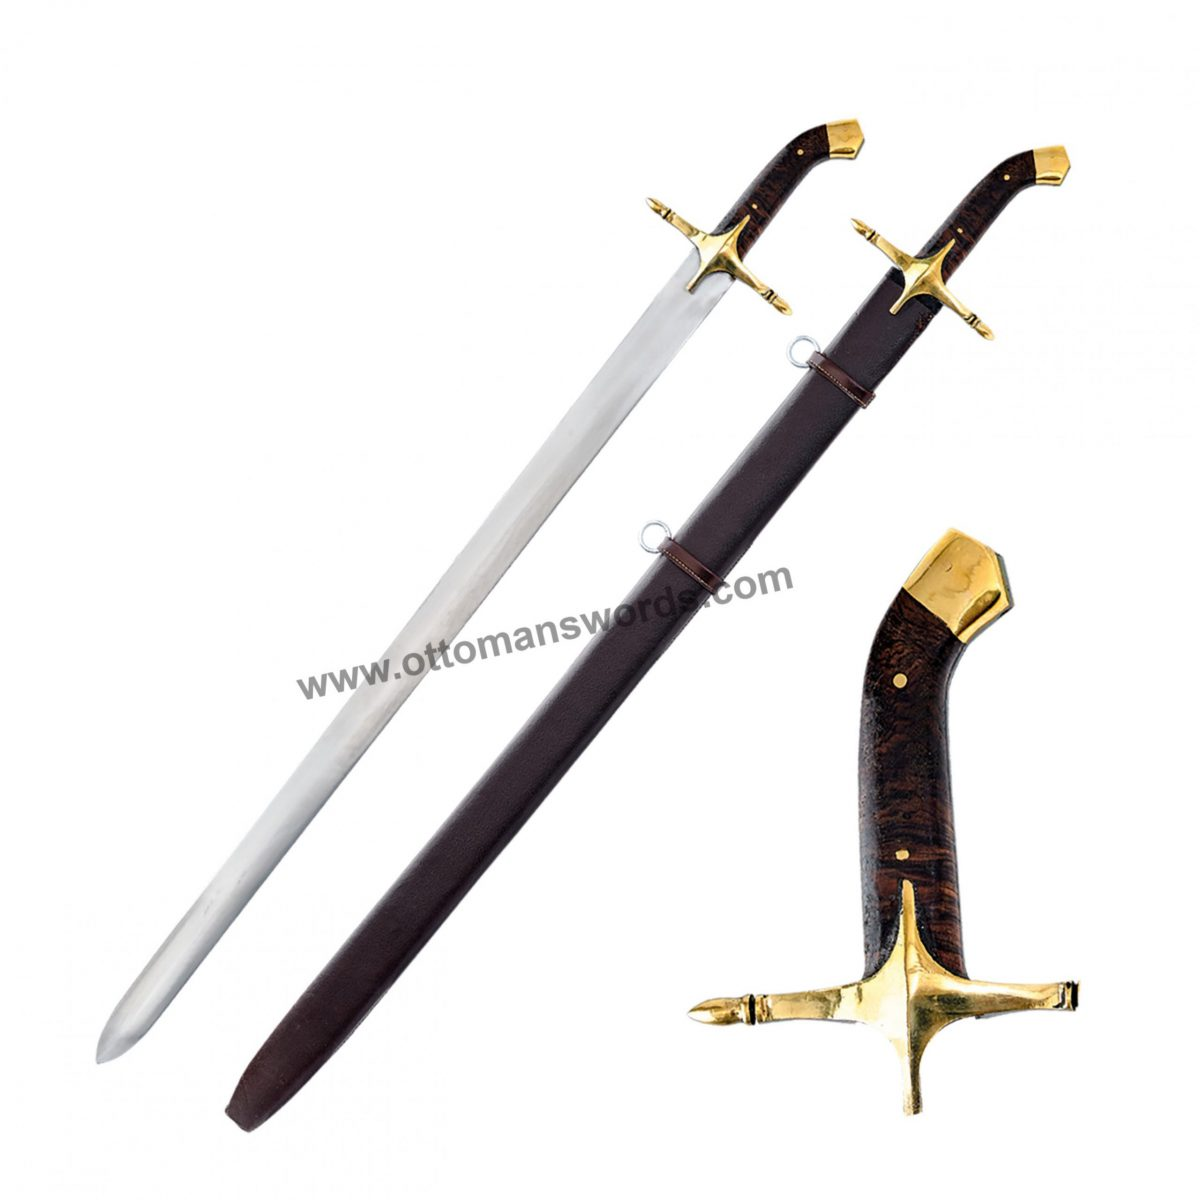 Hazrat Muhammad Replica Sword Al Qadib